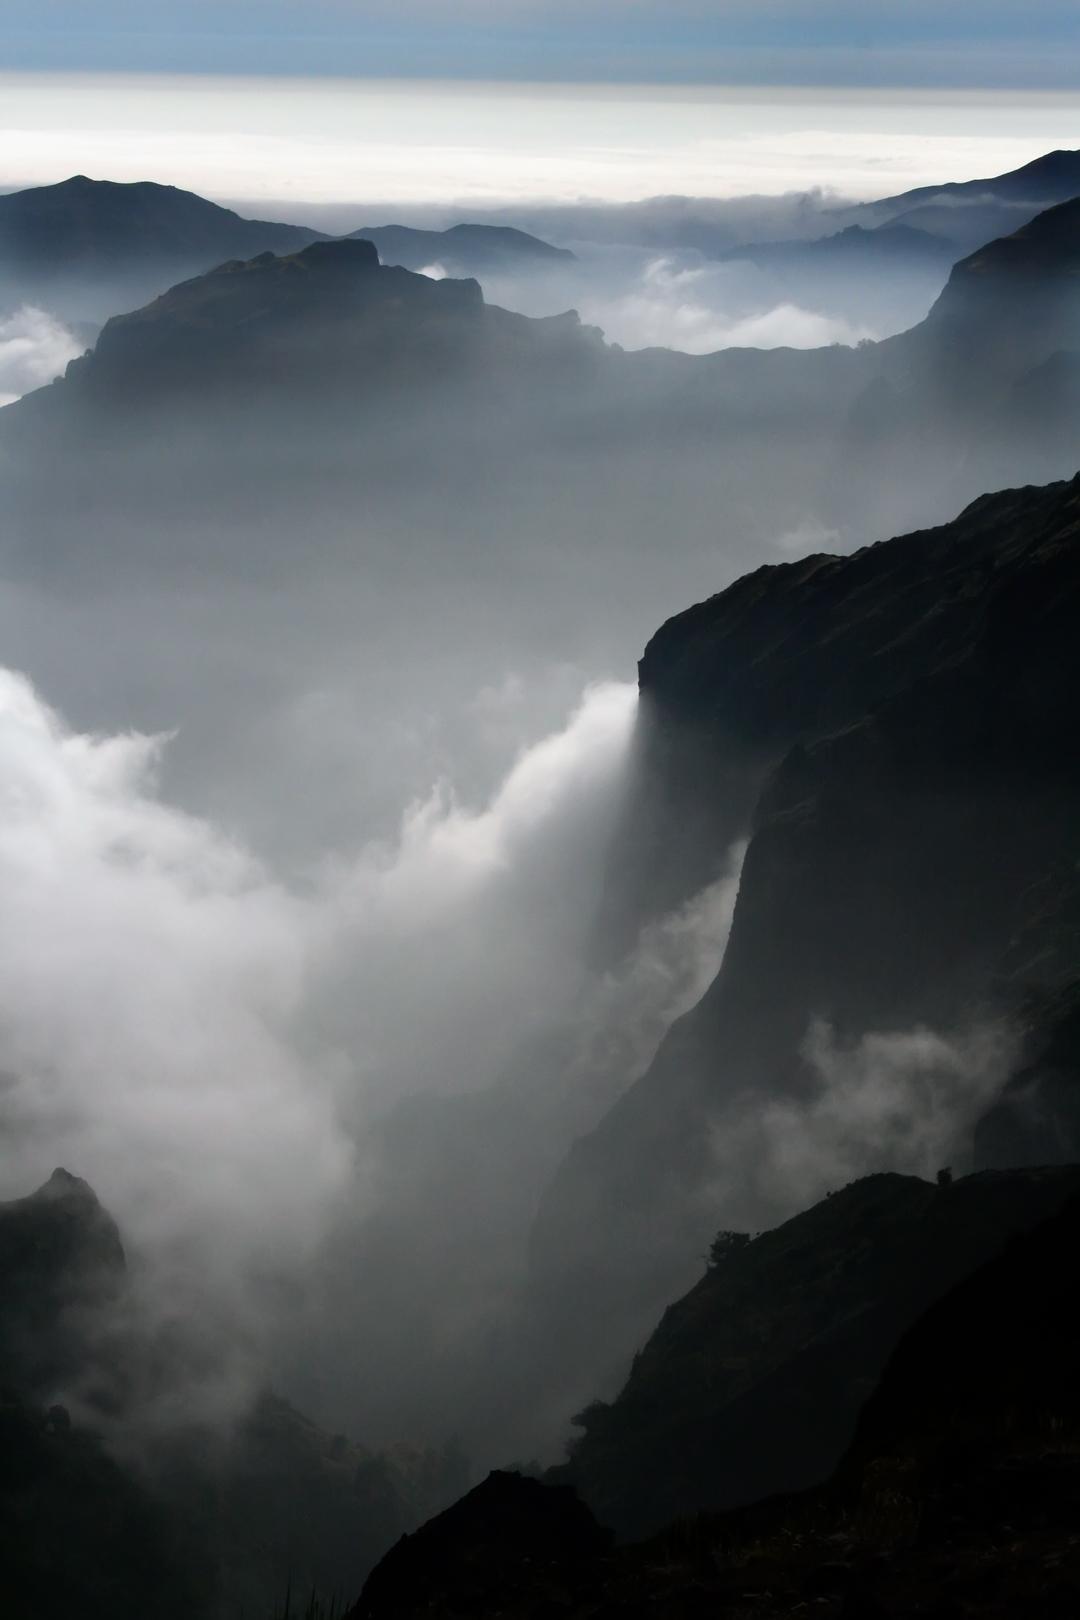 Auslandsreportage / Foto-Dokumentation über Madeira